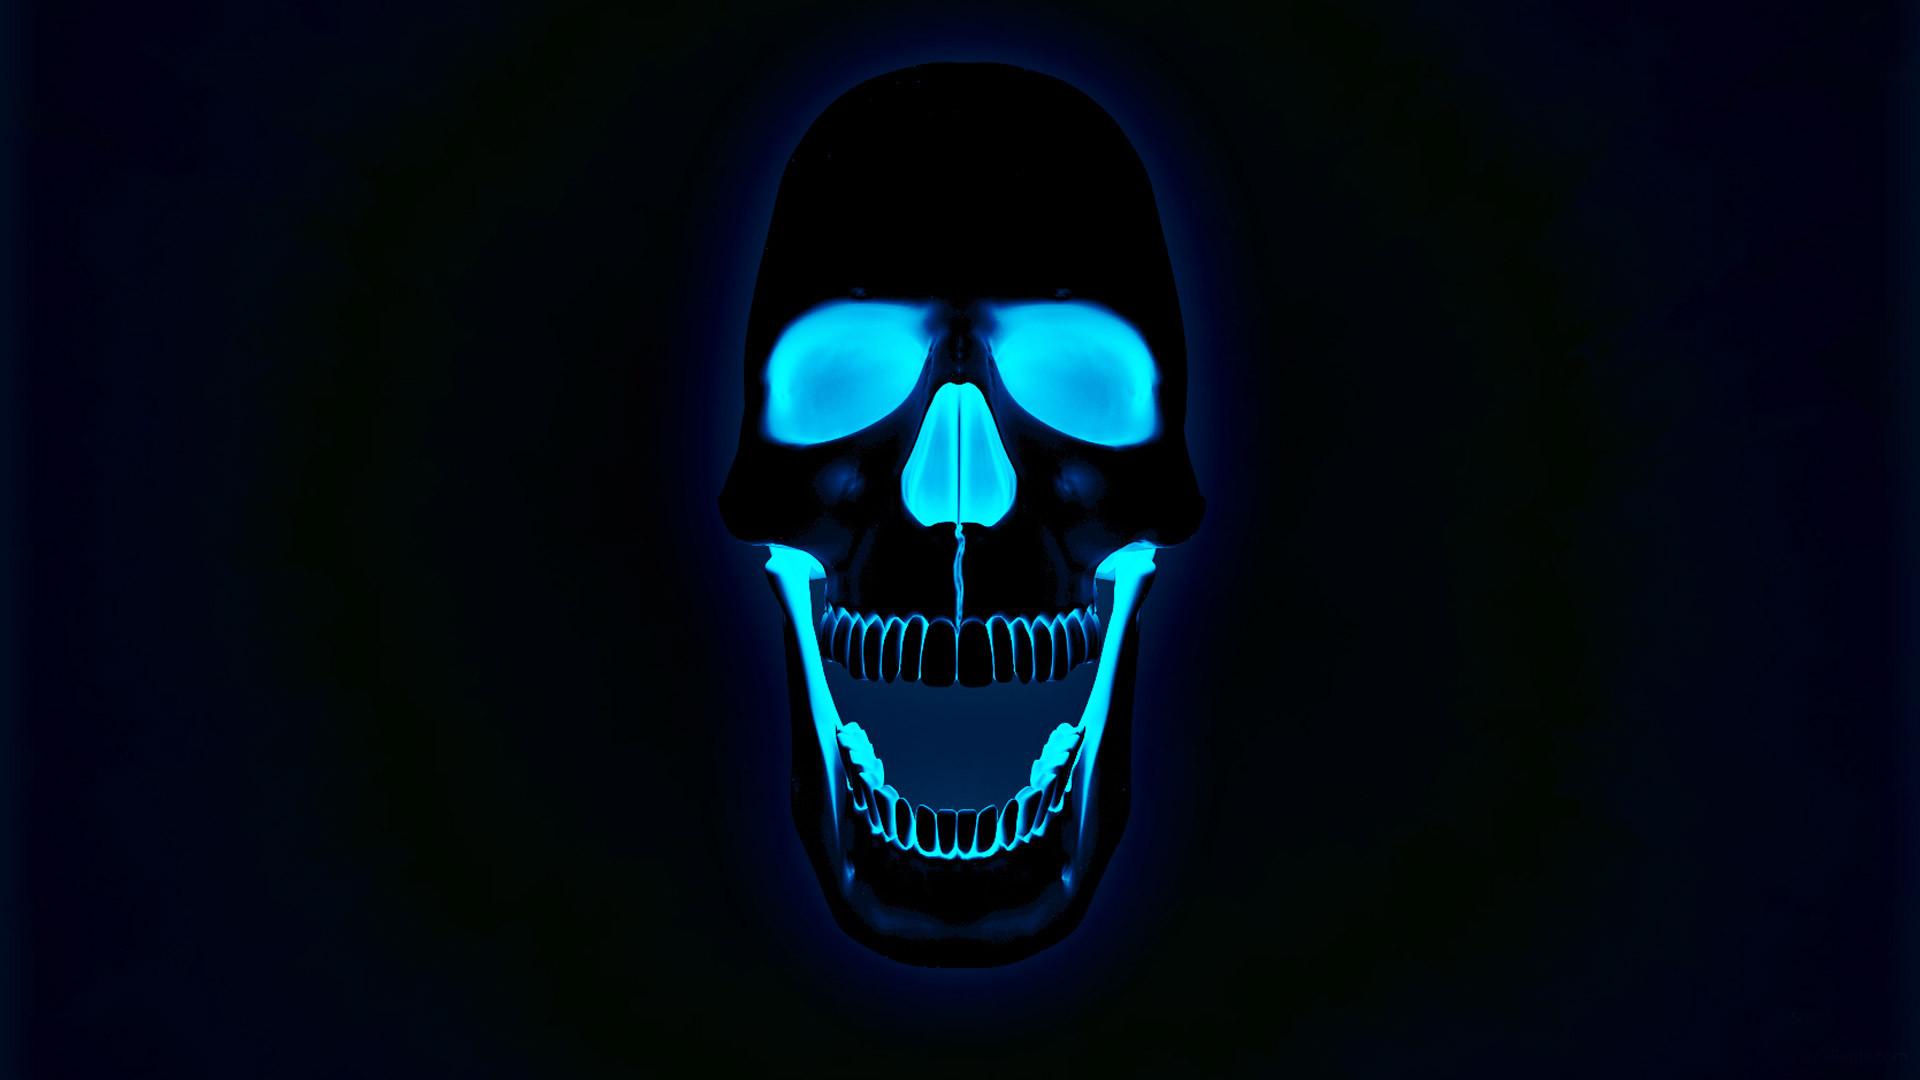 Glowing neon skull wallpaper